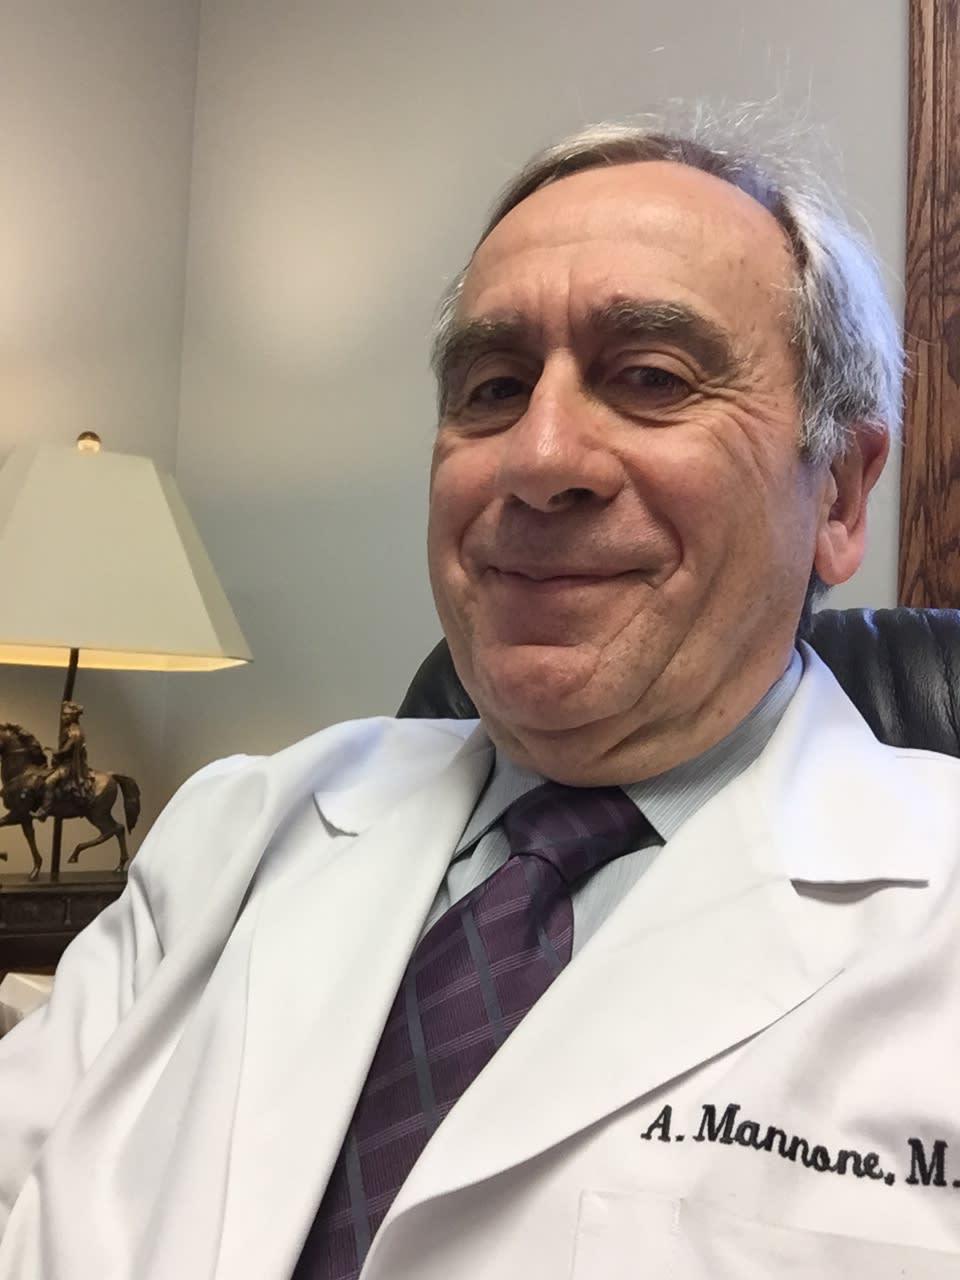 Dr. Antonino Mannone MD